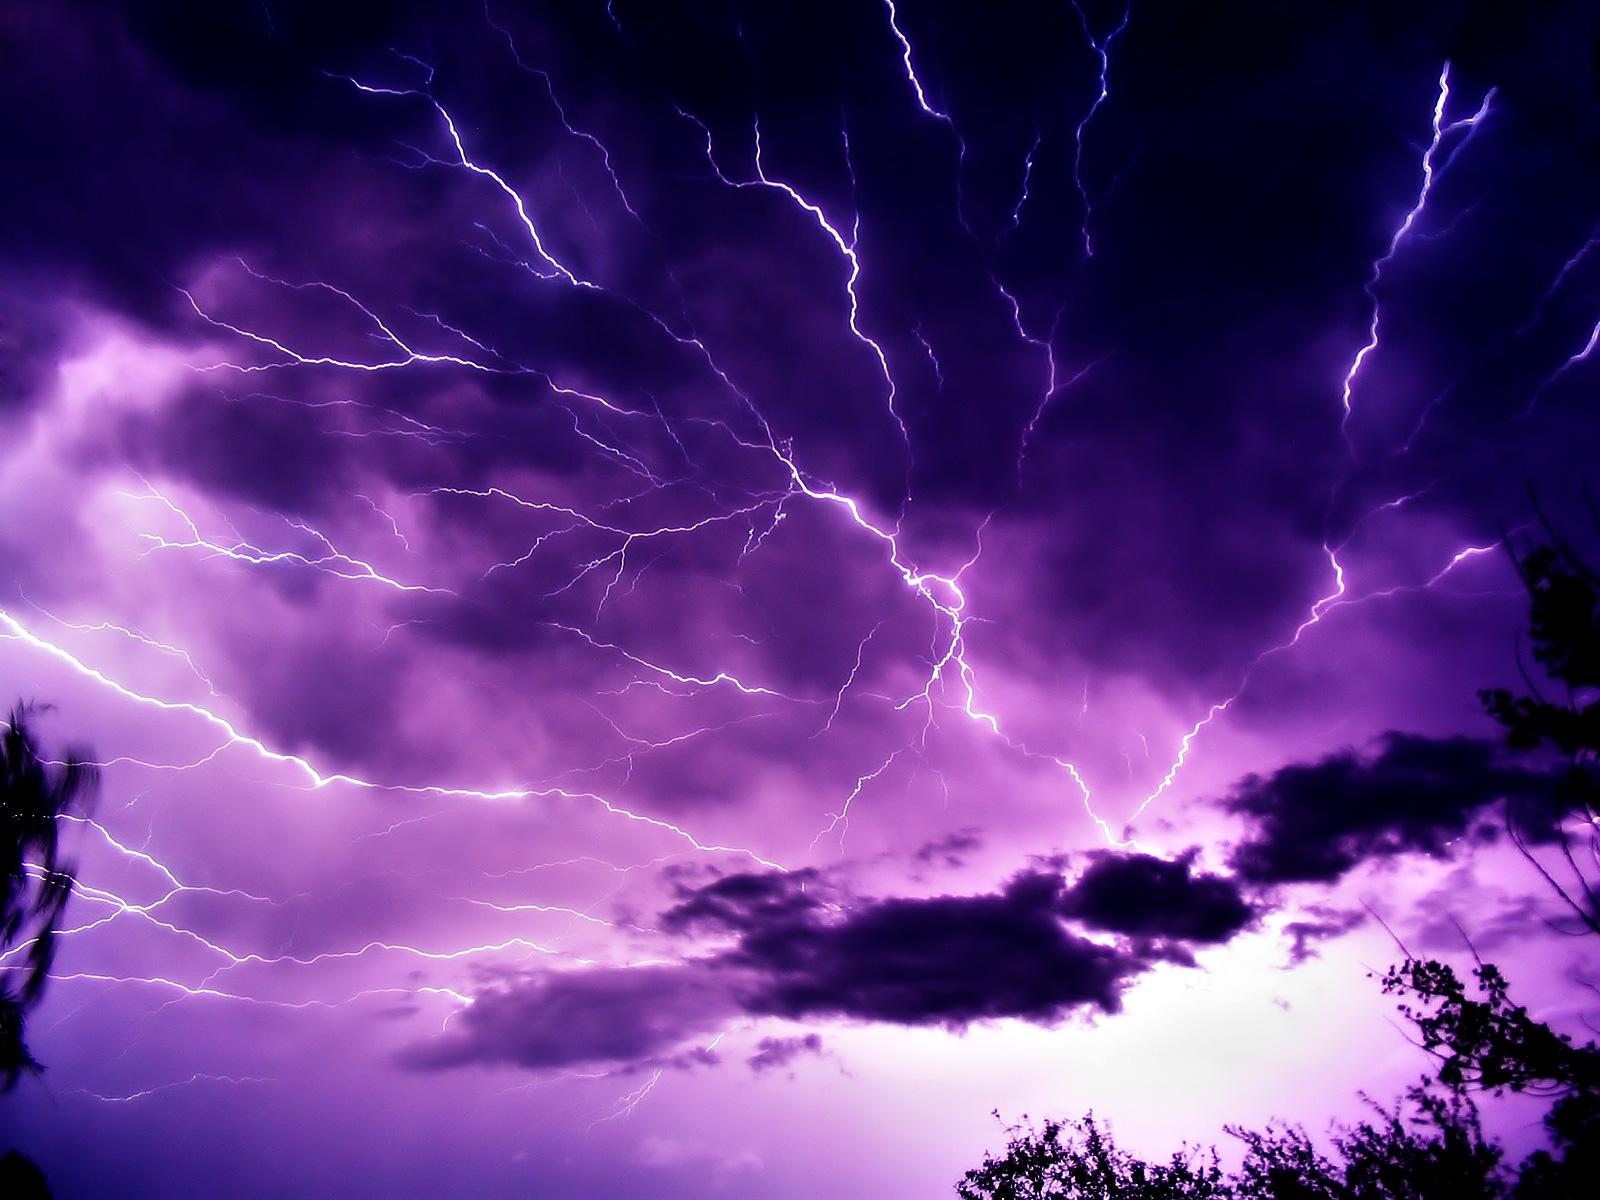 http://4.bp.blogspot.com/-6rtQjLElUGM/UEy2bJ6JPnI/AAAAAAAAAVY/3ltbCnnVkus/s1600/The-best-top-desktop-lightning-wallpapers-lightning-wallpaper-4.jpg